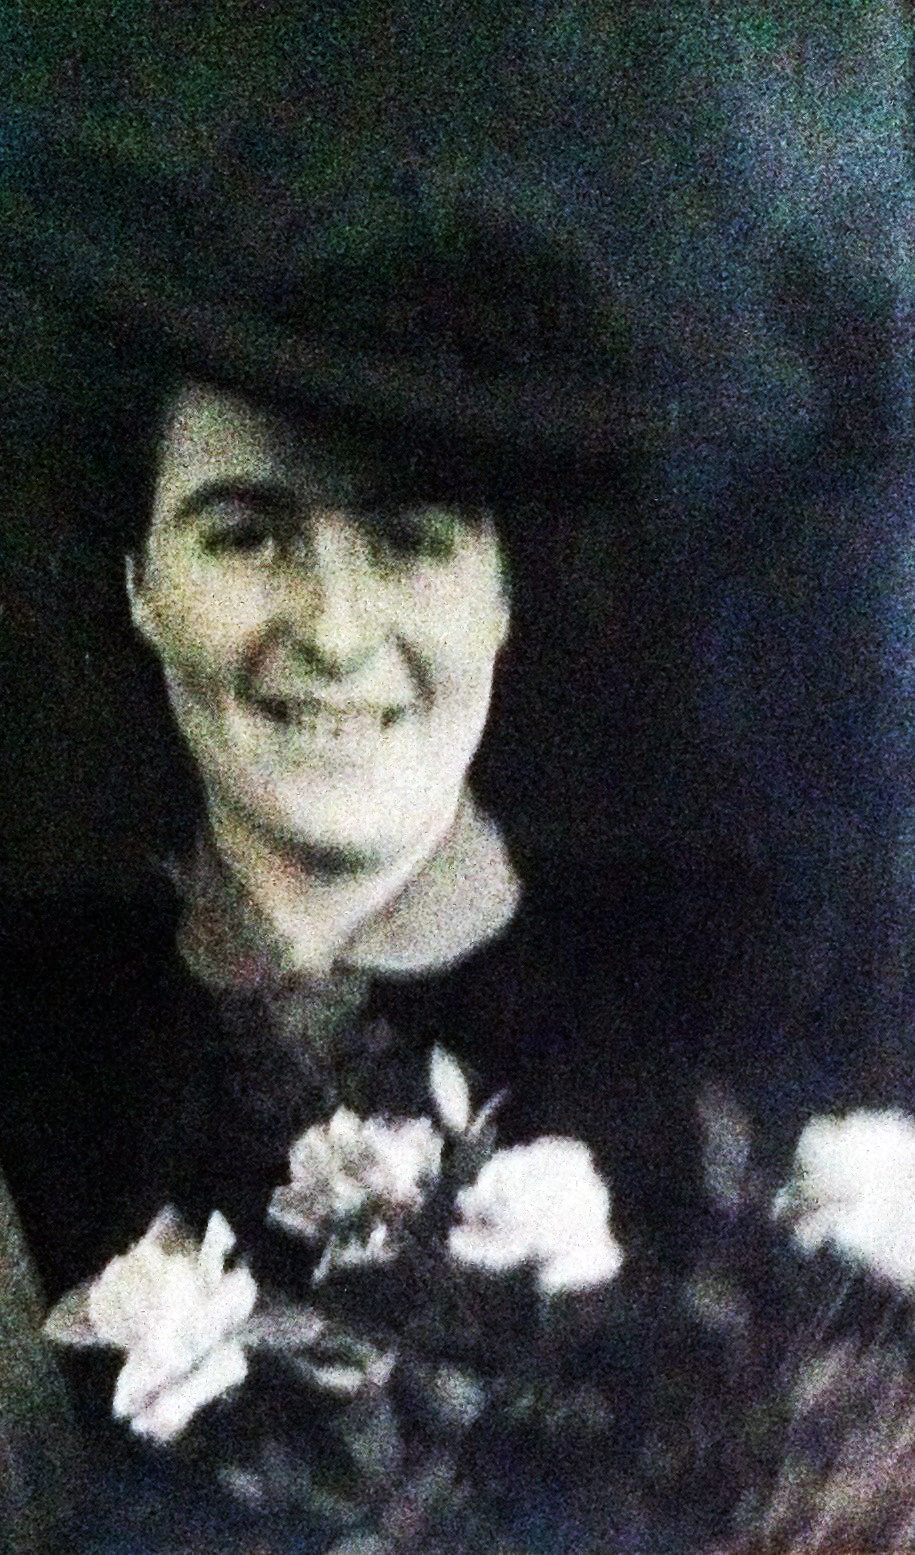 Frank Beresford's wife Muriel Foxall